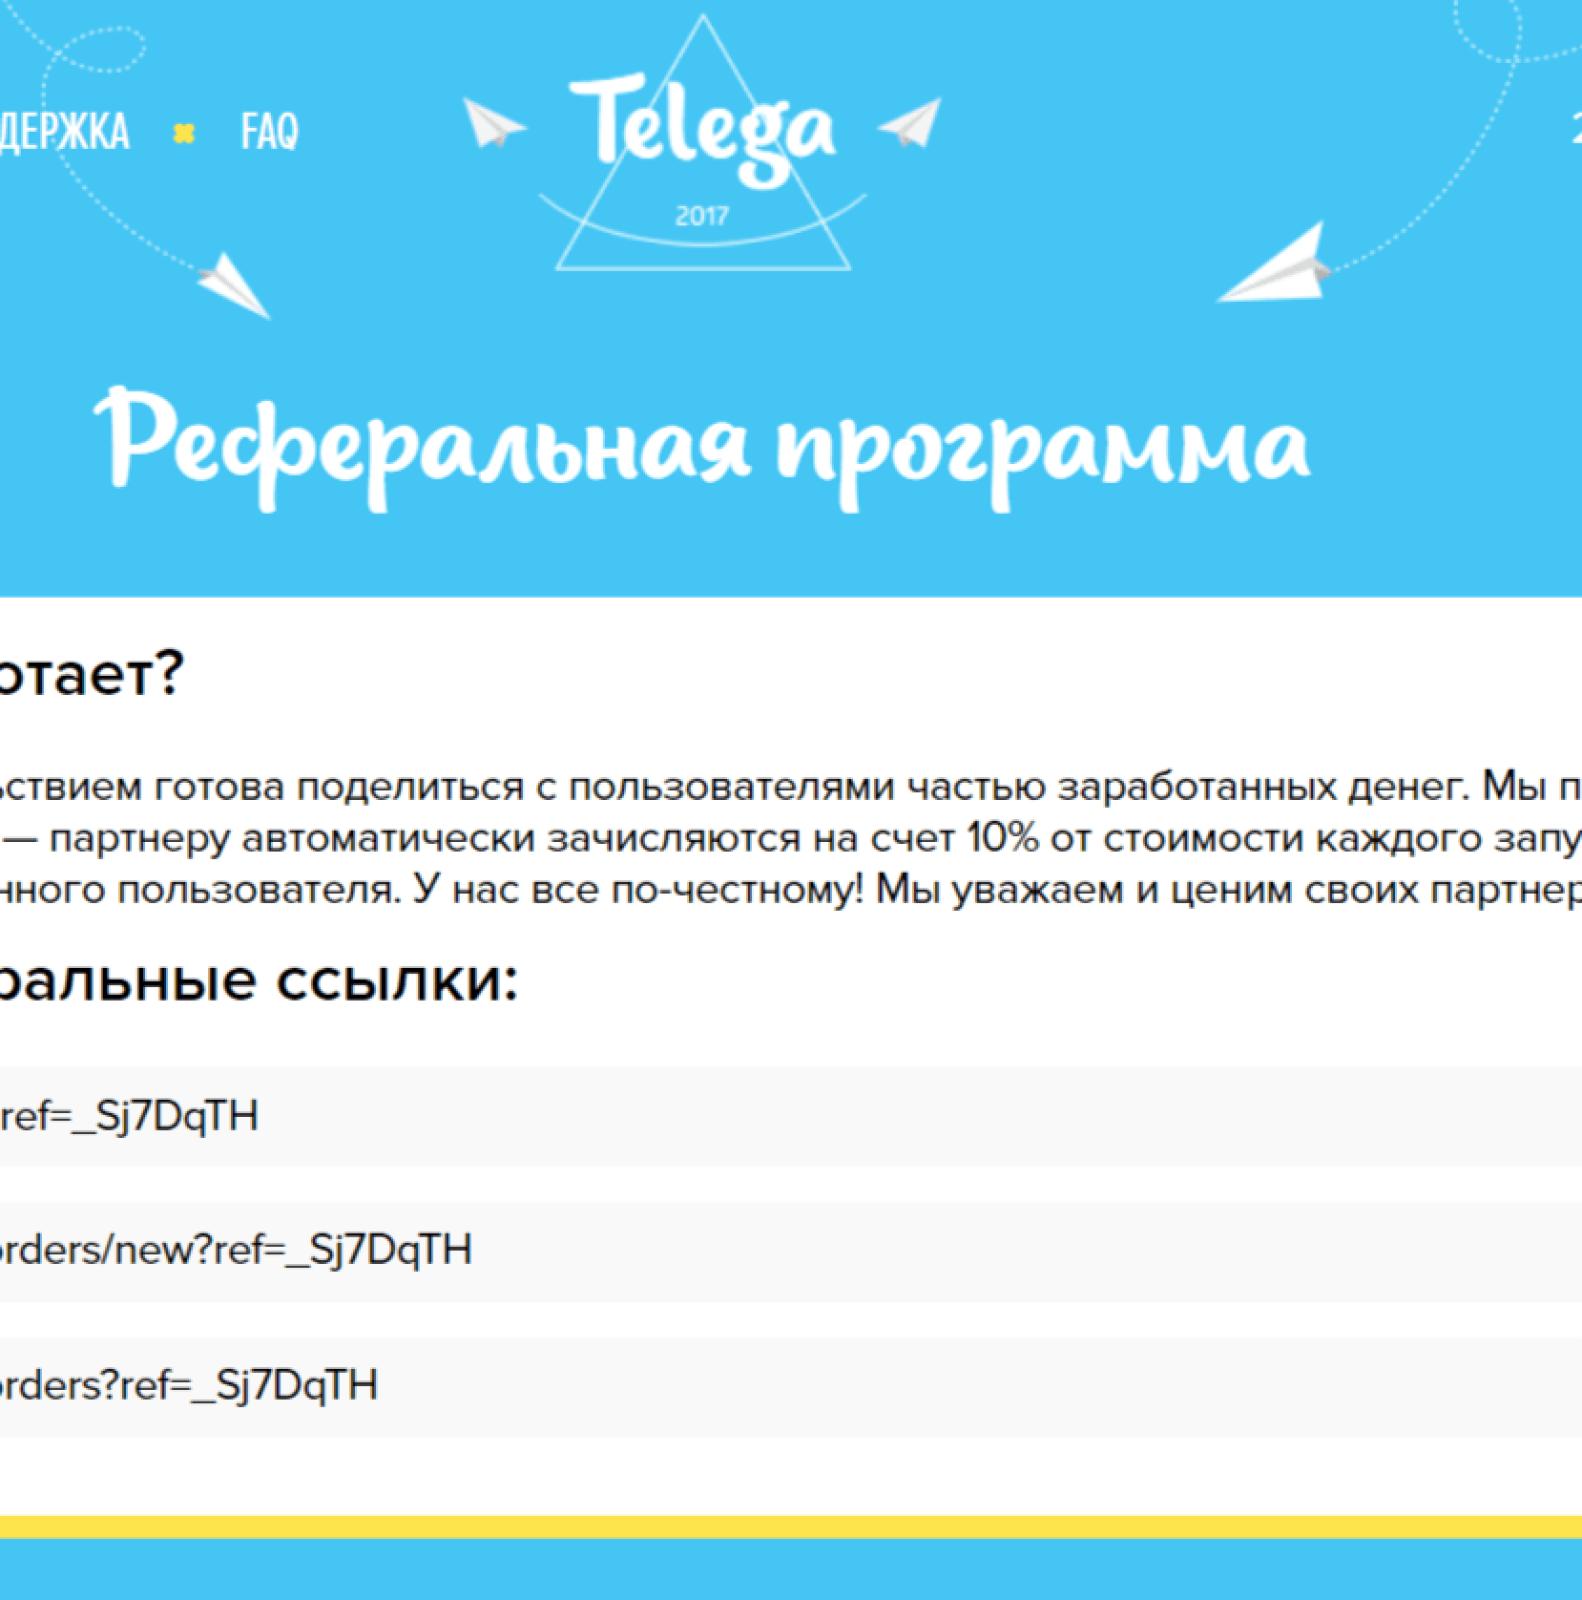 Телега — кабинет партнёра